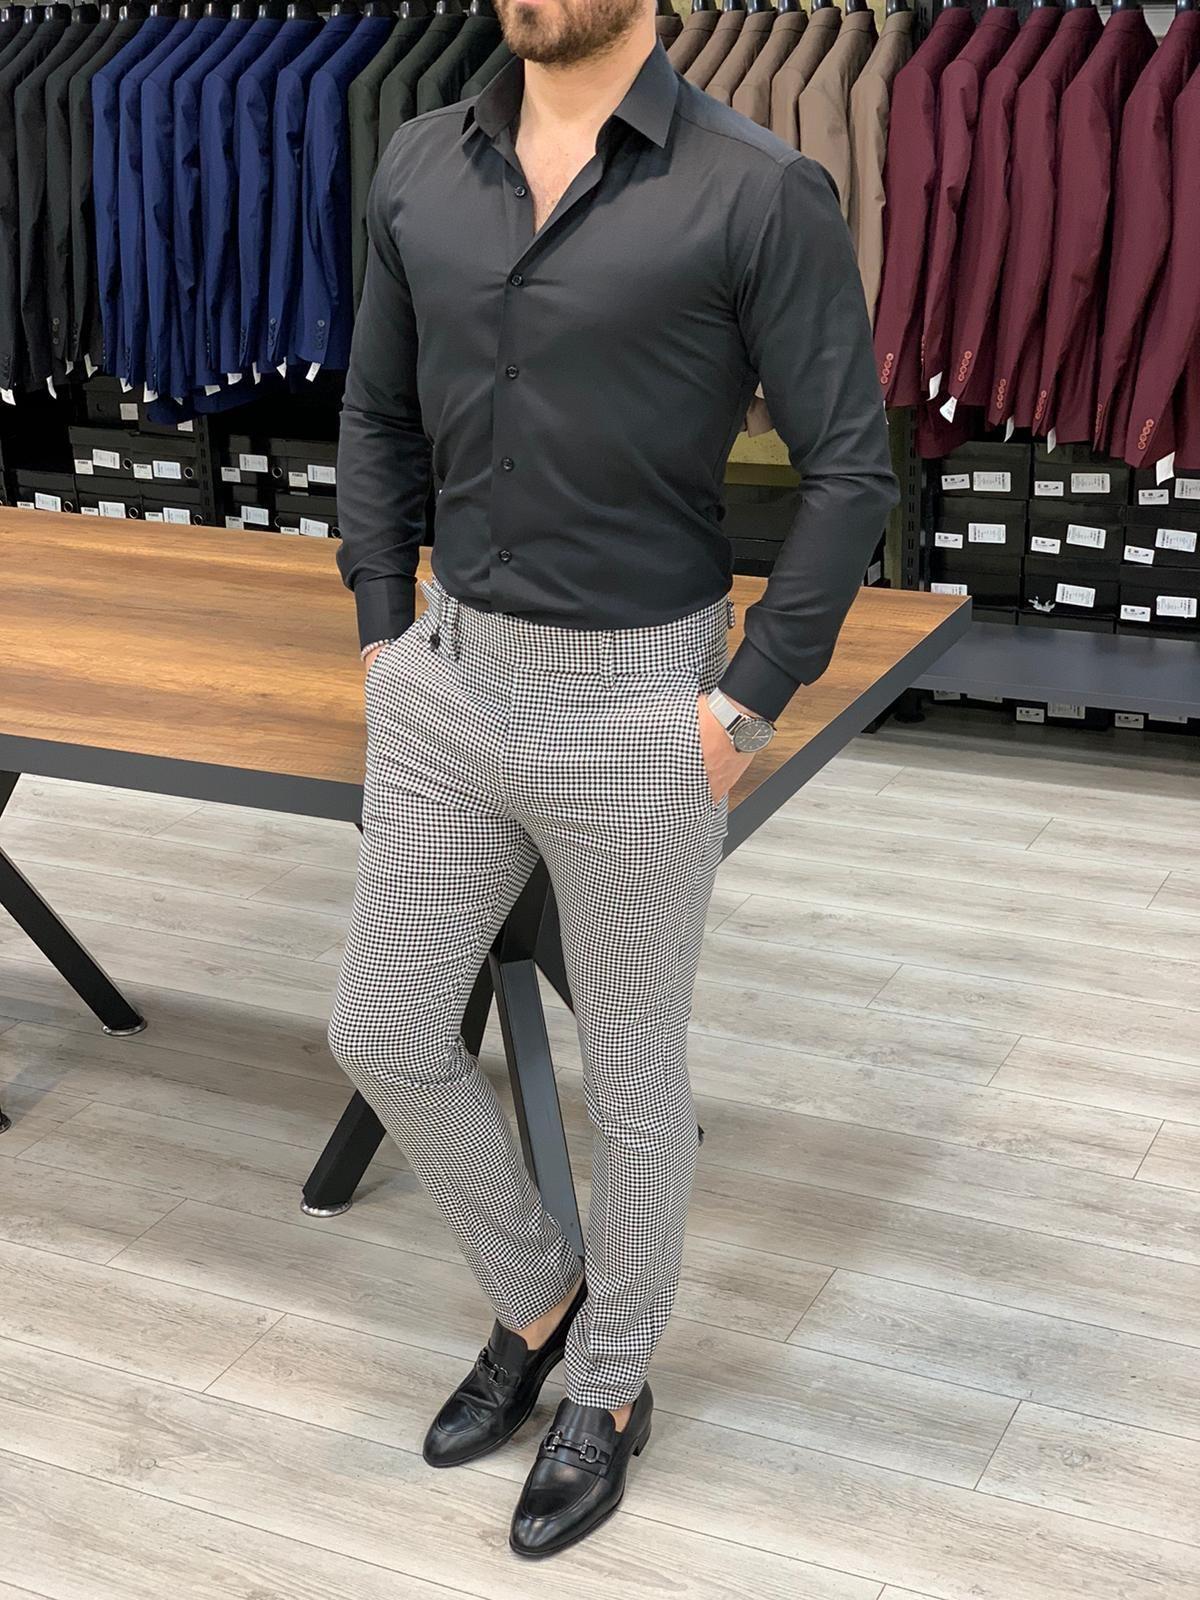 Ferrar Black White Plaid Pants Slim Fit Shirt Slim Fit Pants Men Slim Fit Pants [ 1600 x 1200 Pixel ]